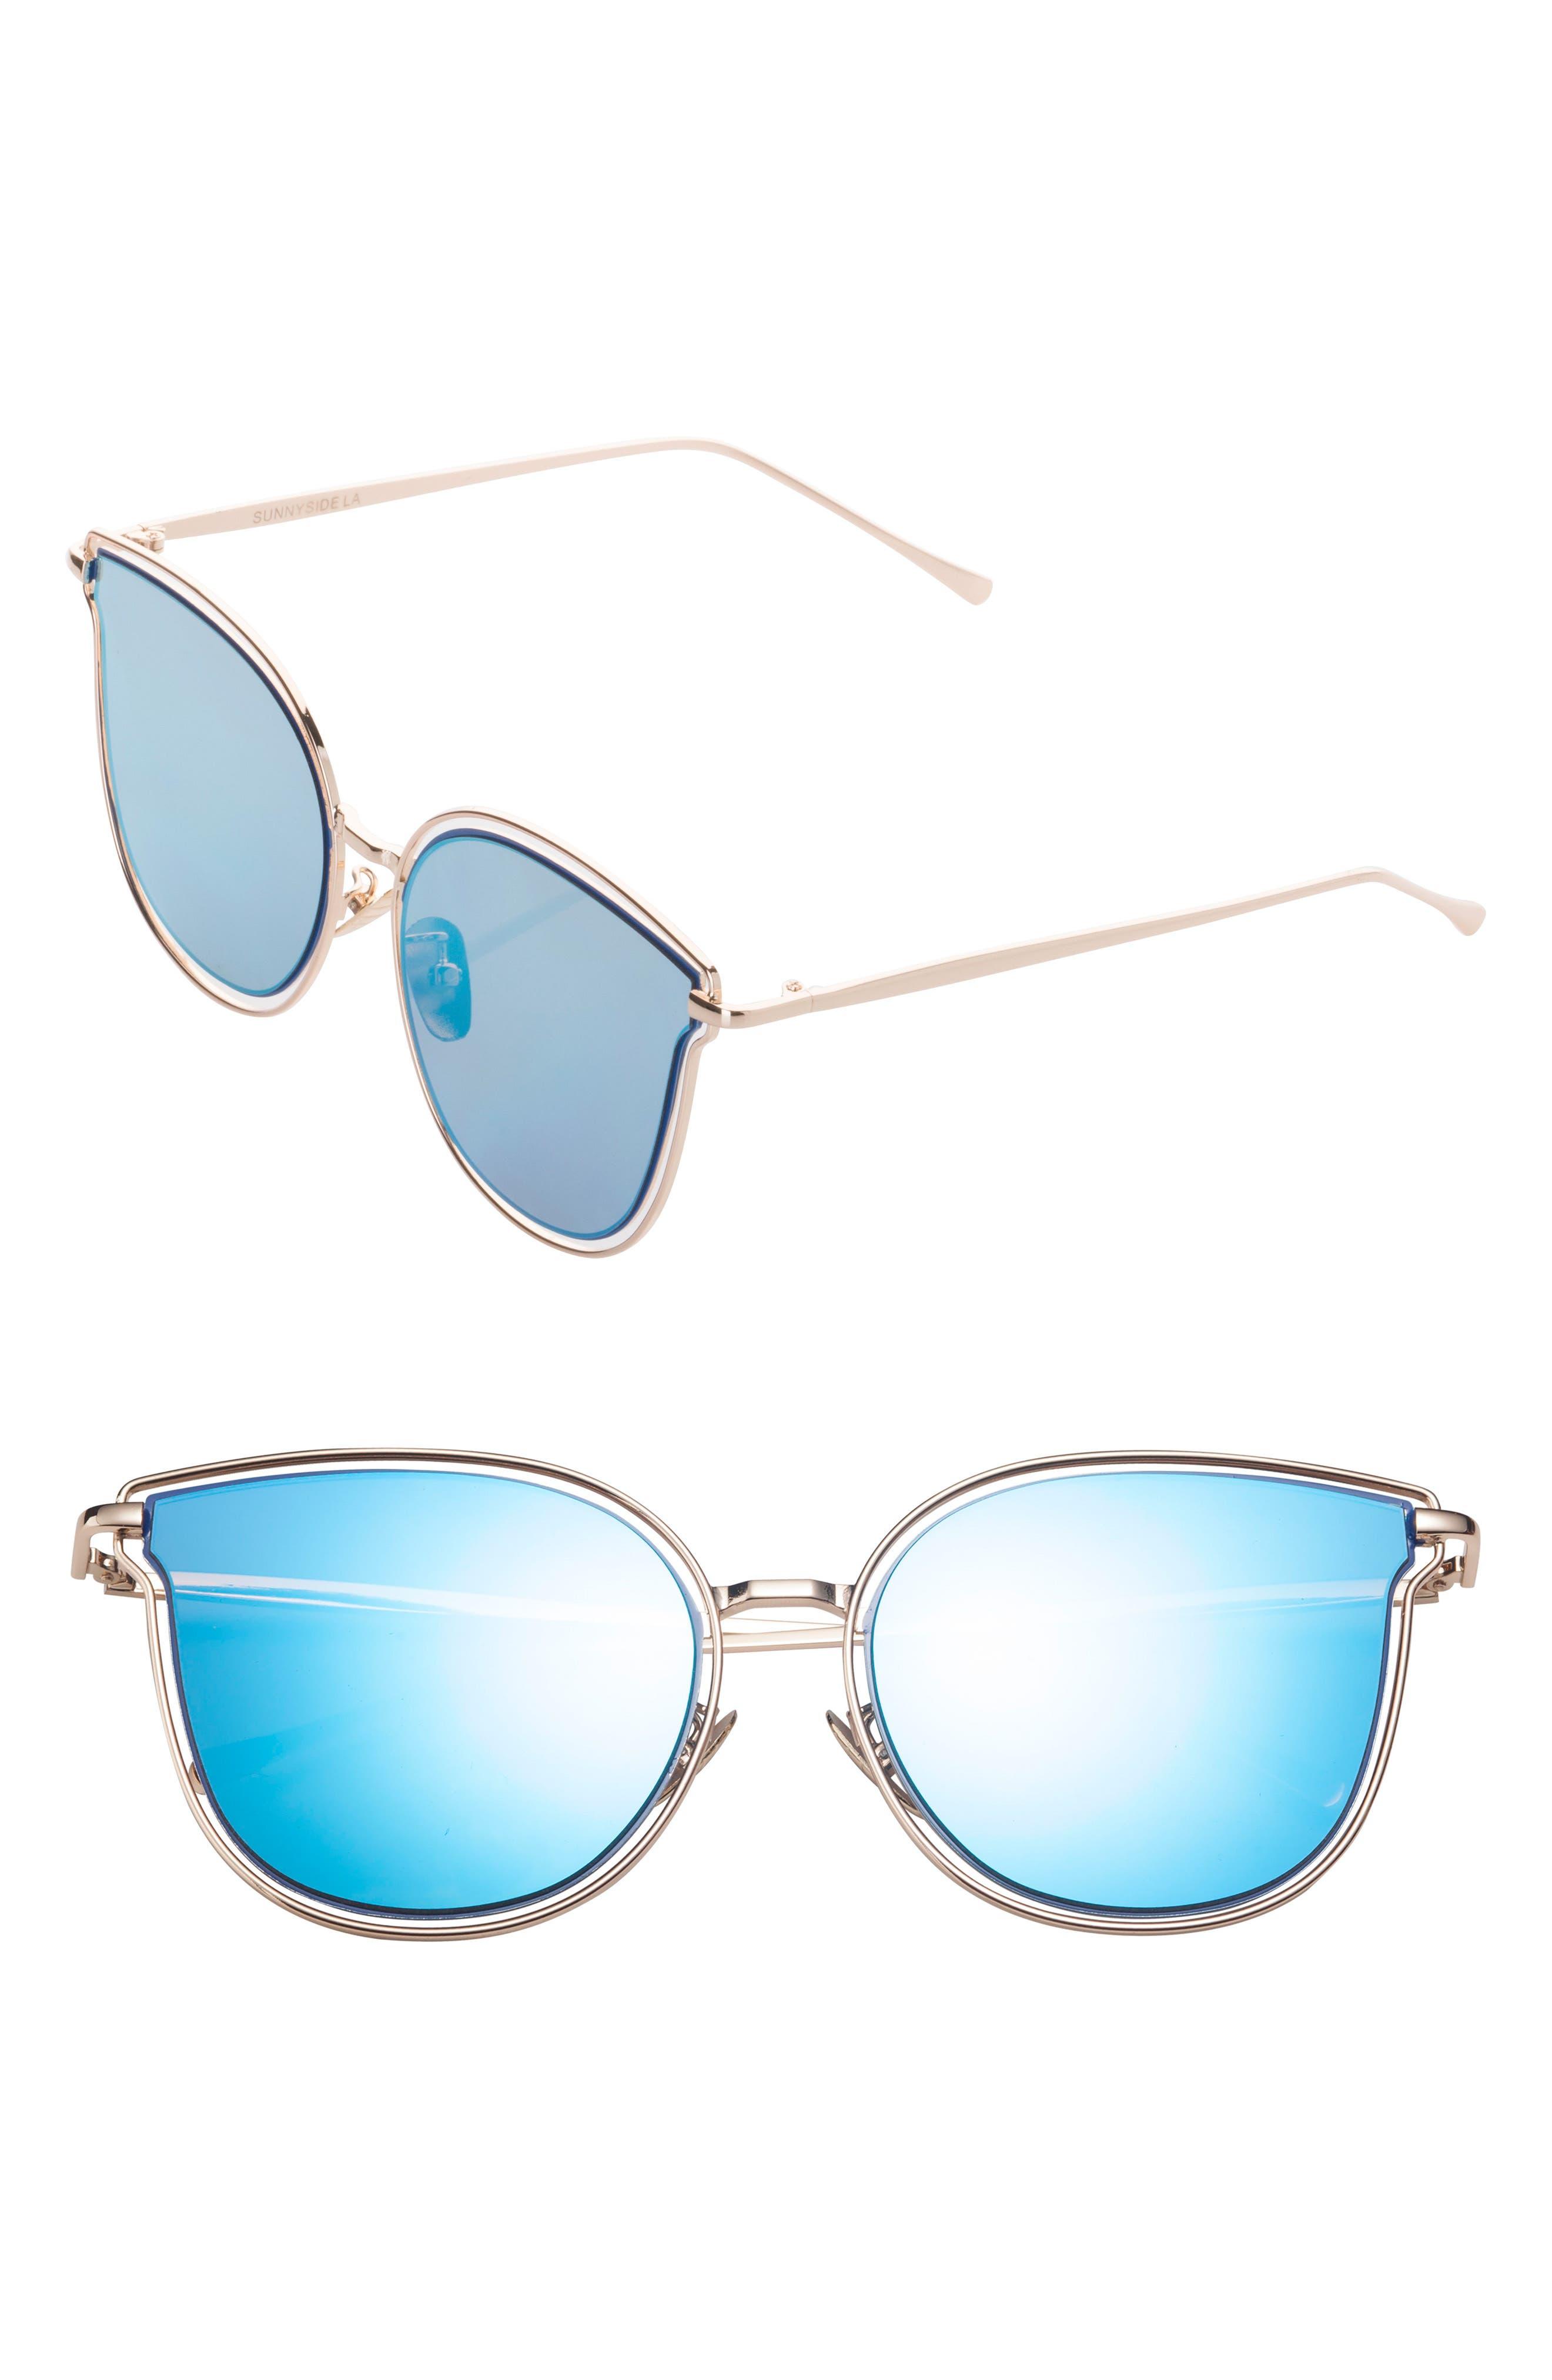 54mm Sunglasses,                         Main,                         color, Blue/ Gold